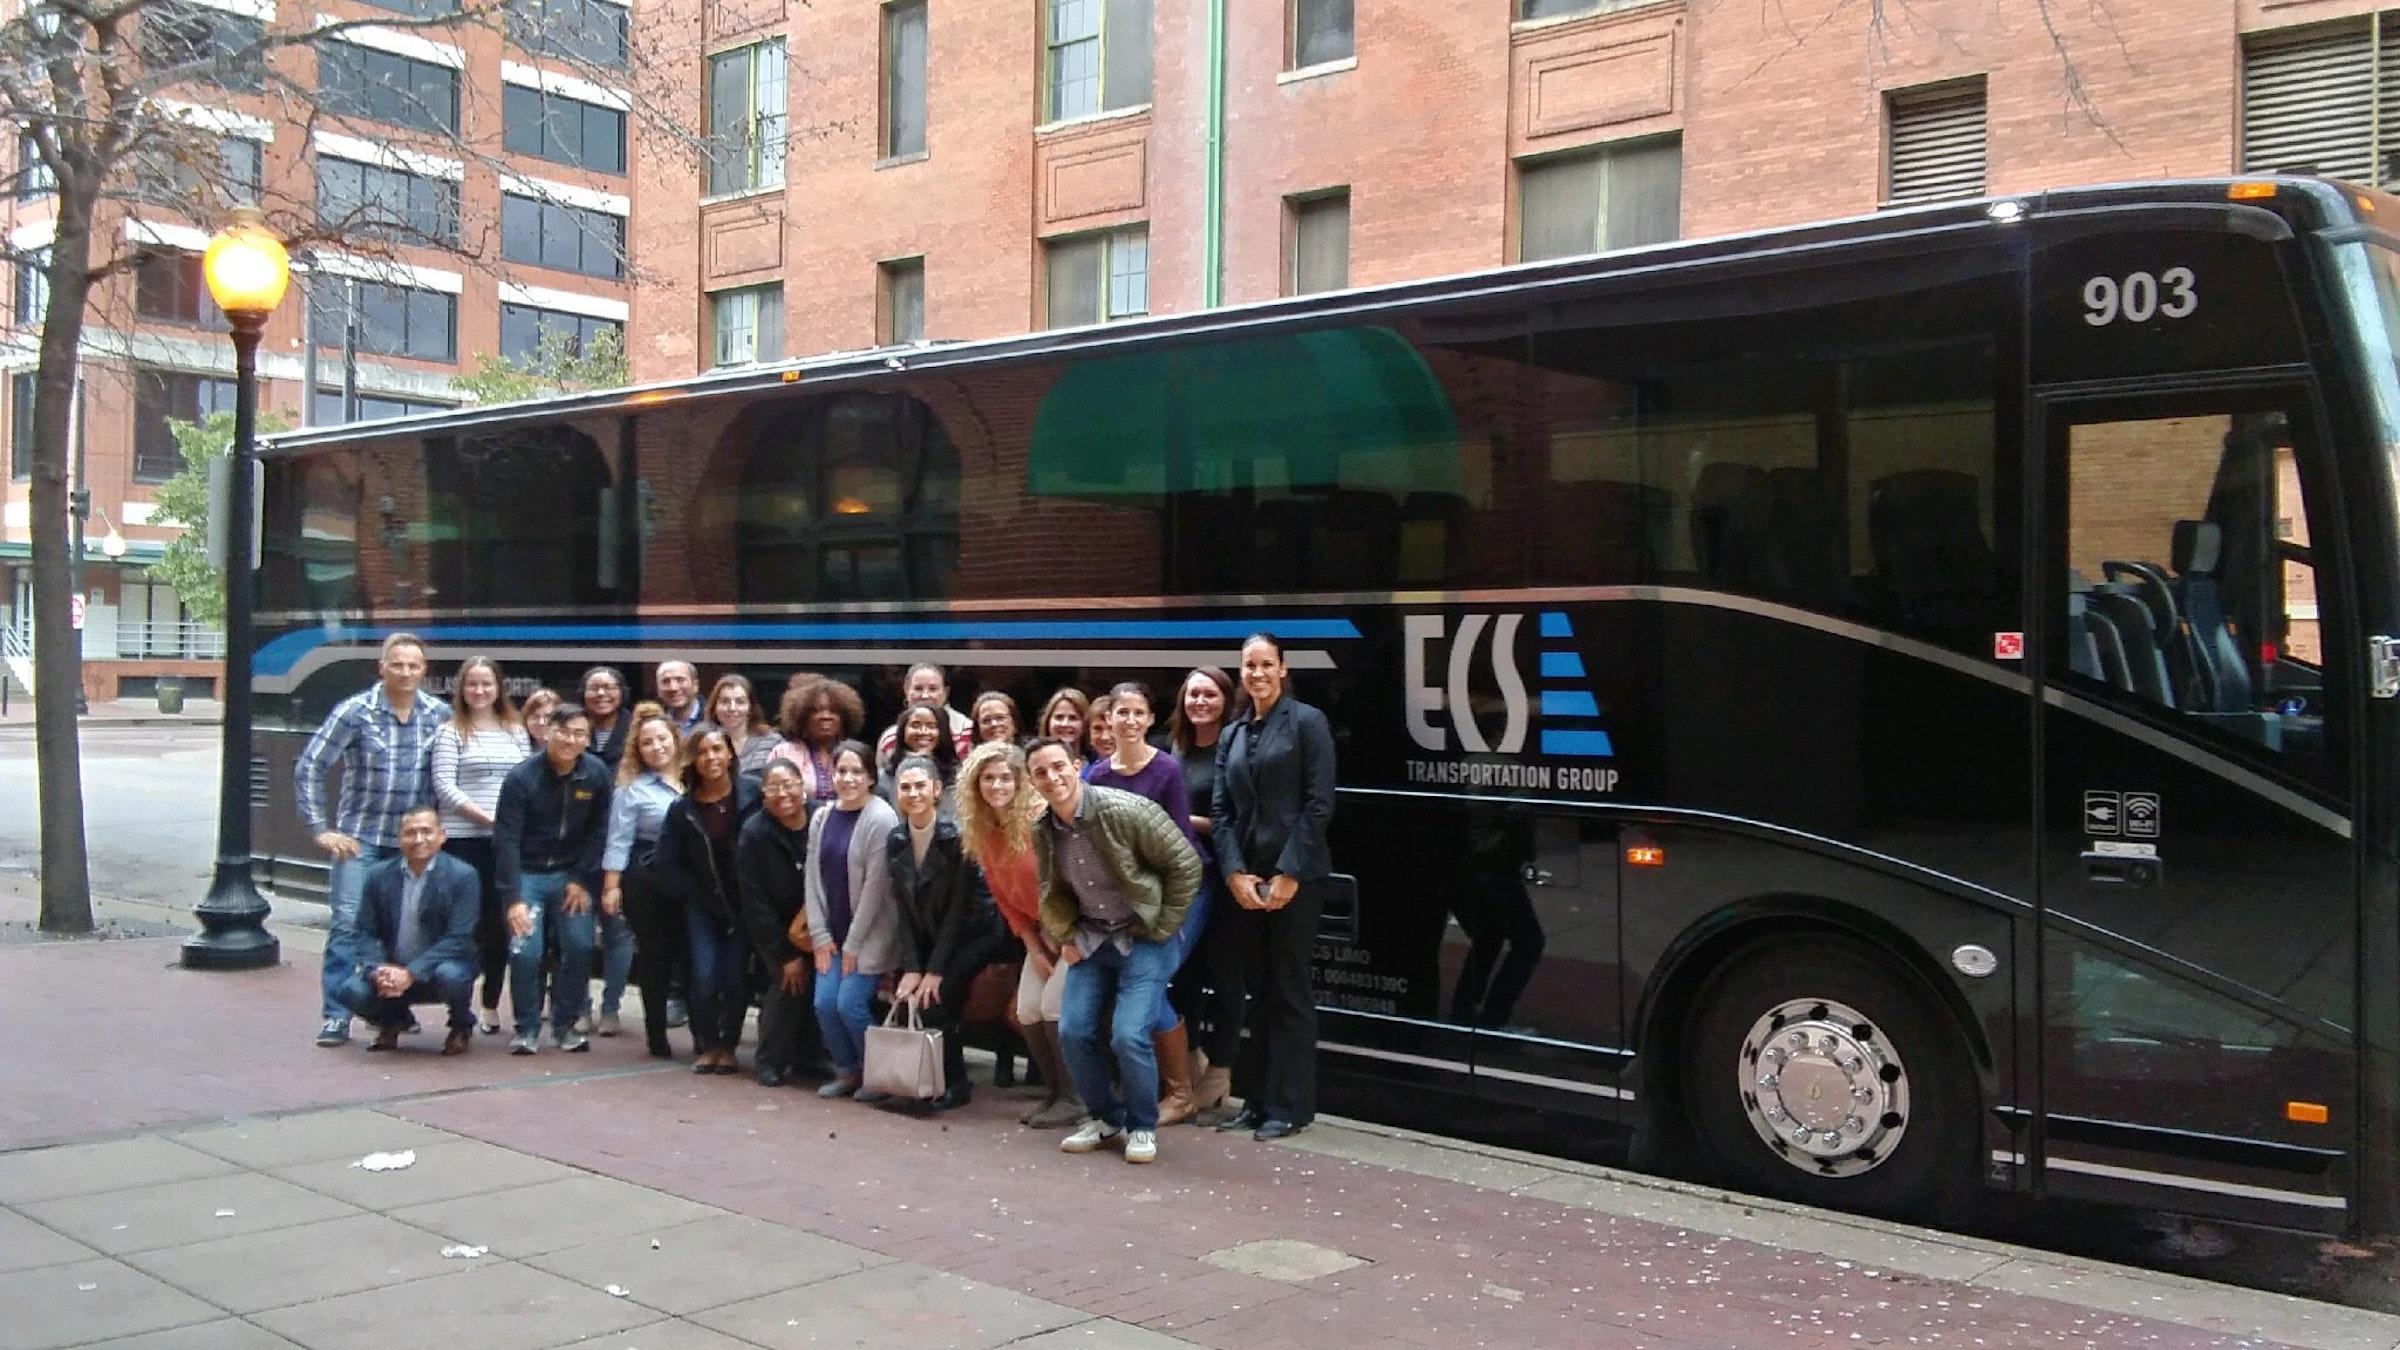 ECS Transportation Group in Beyond Dallas